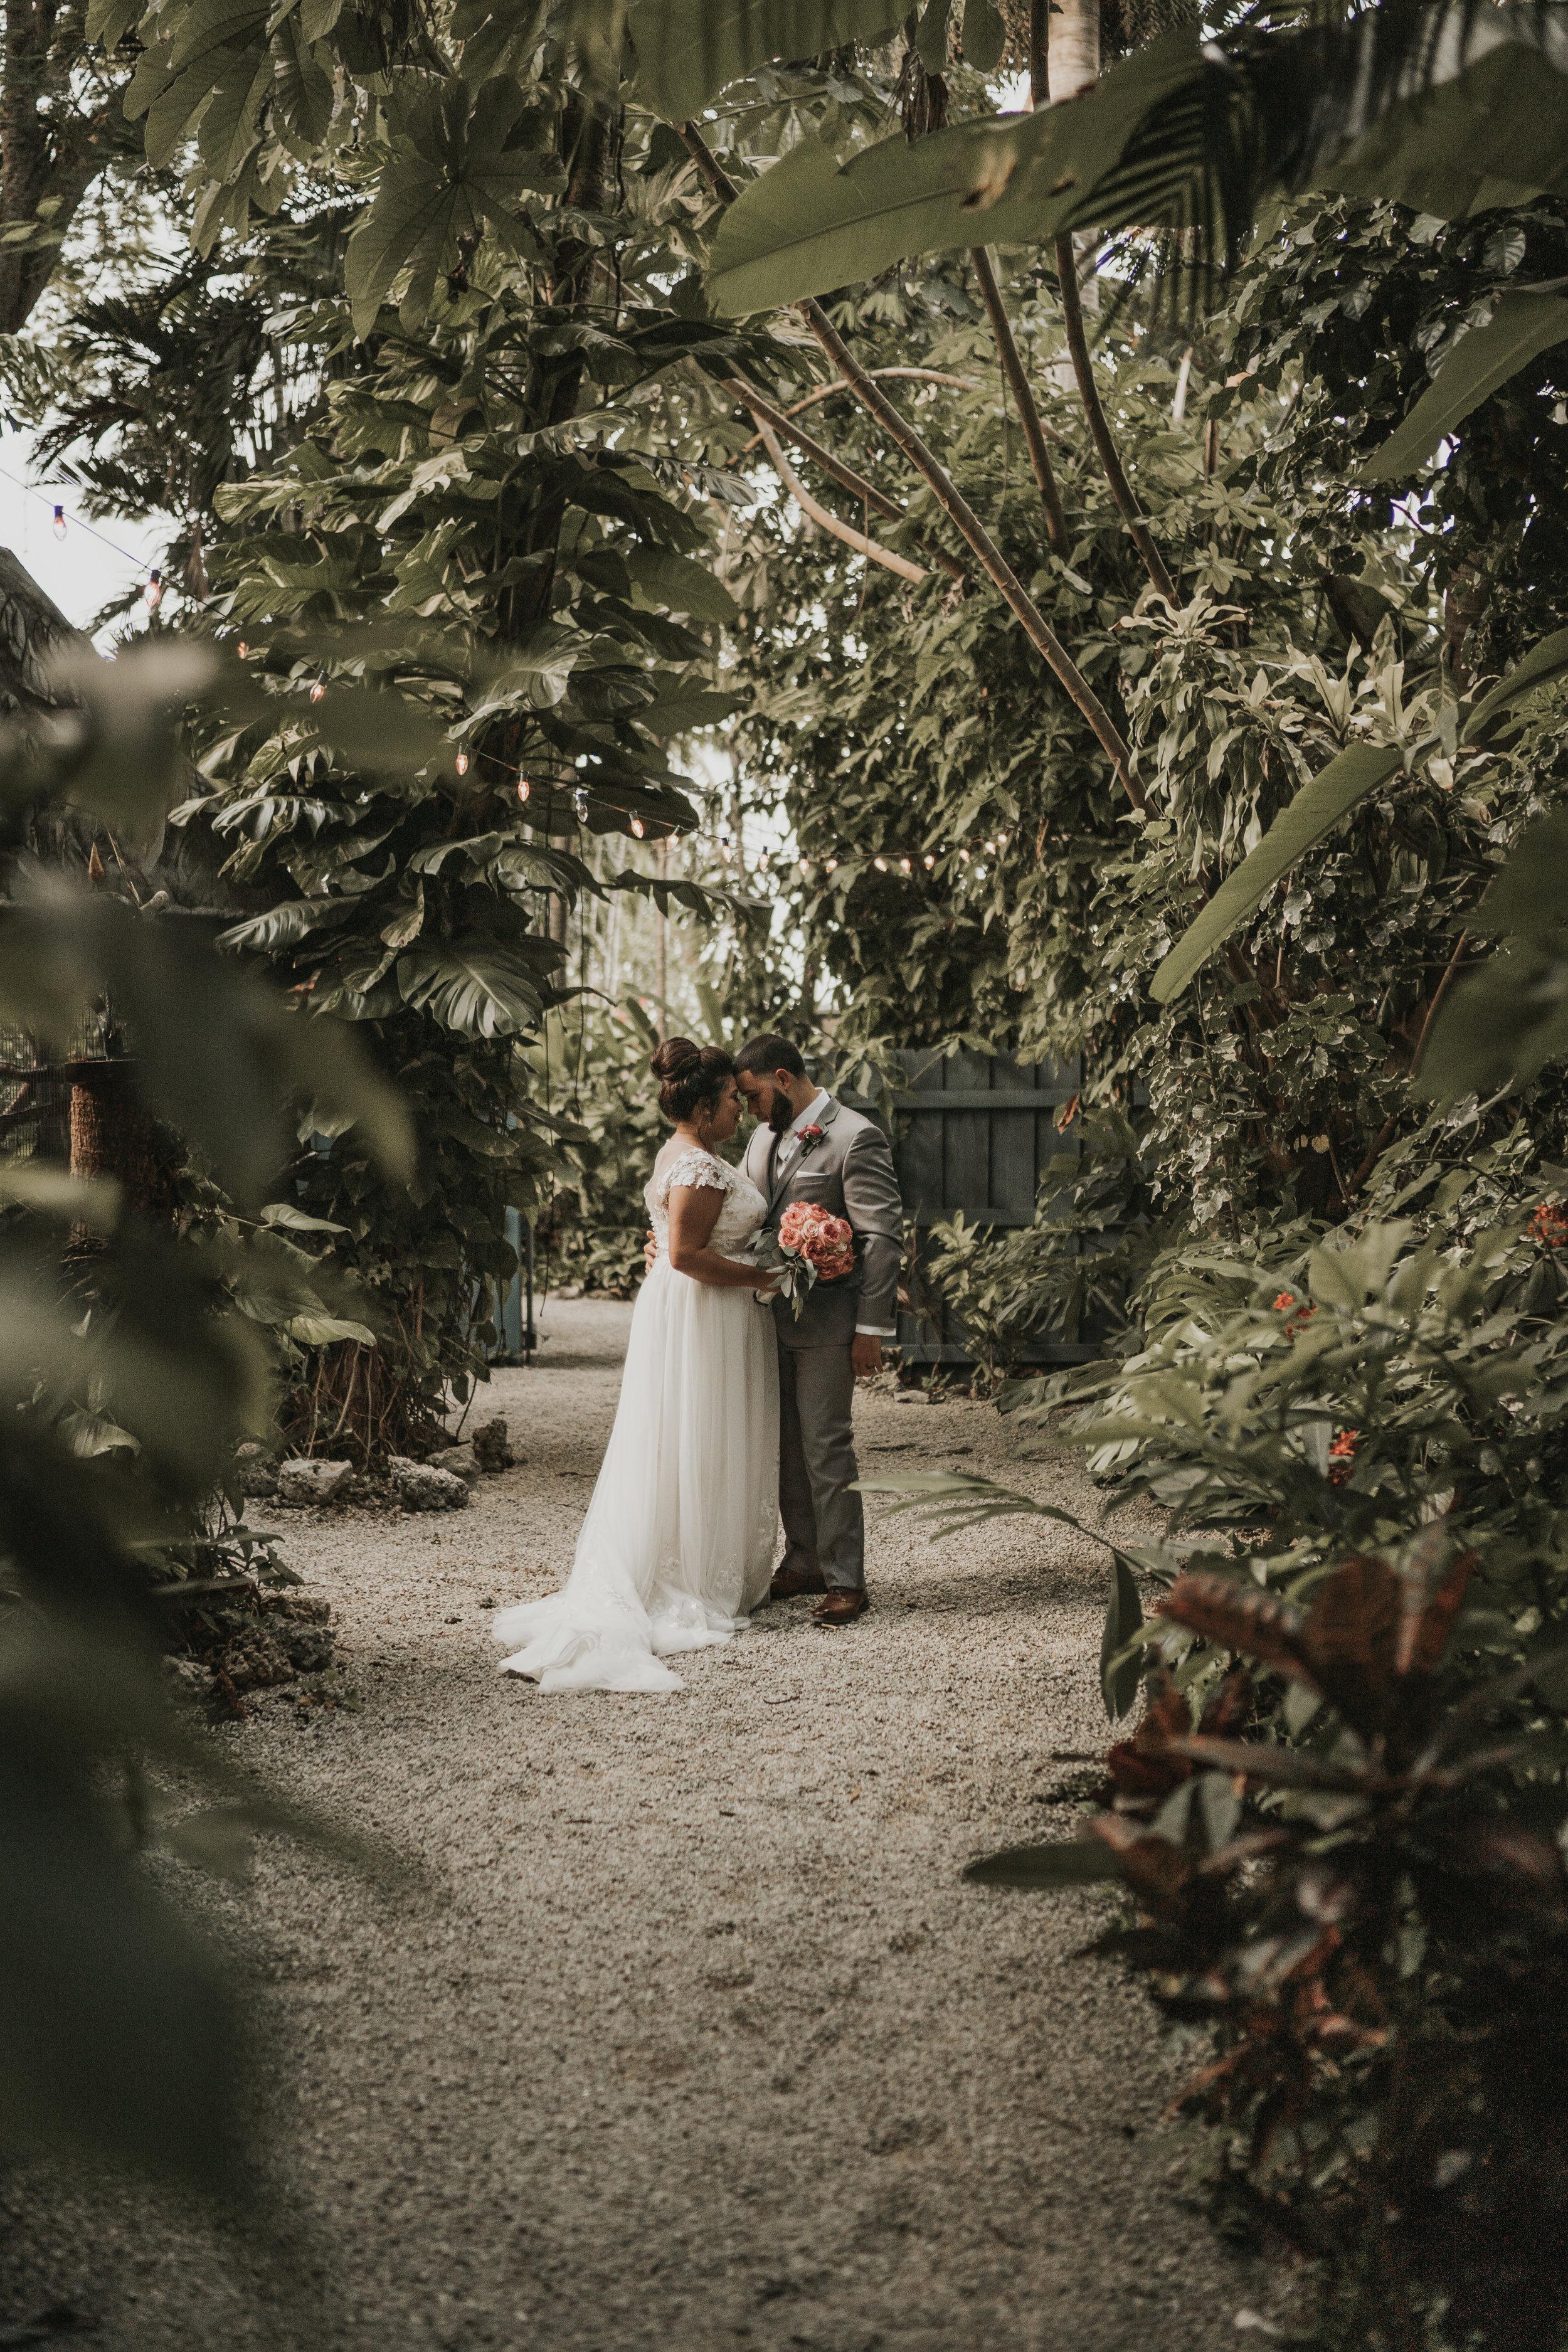 323MICHI&GABEWEDDINGDAY(WeddingFinal).jpg